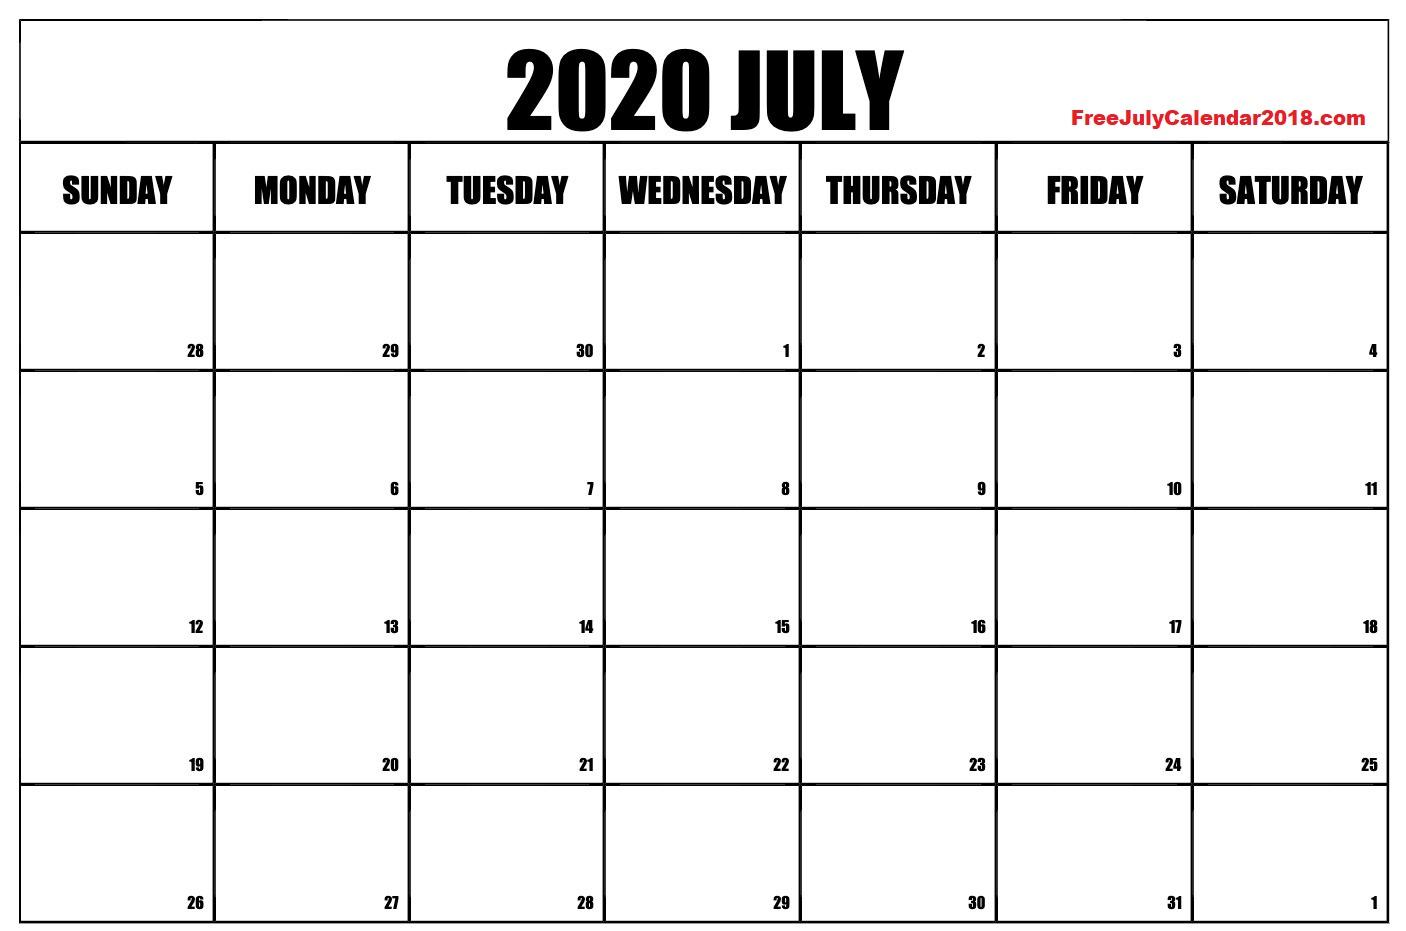 2020 July Calendar